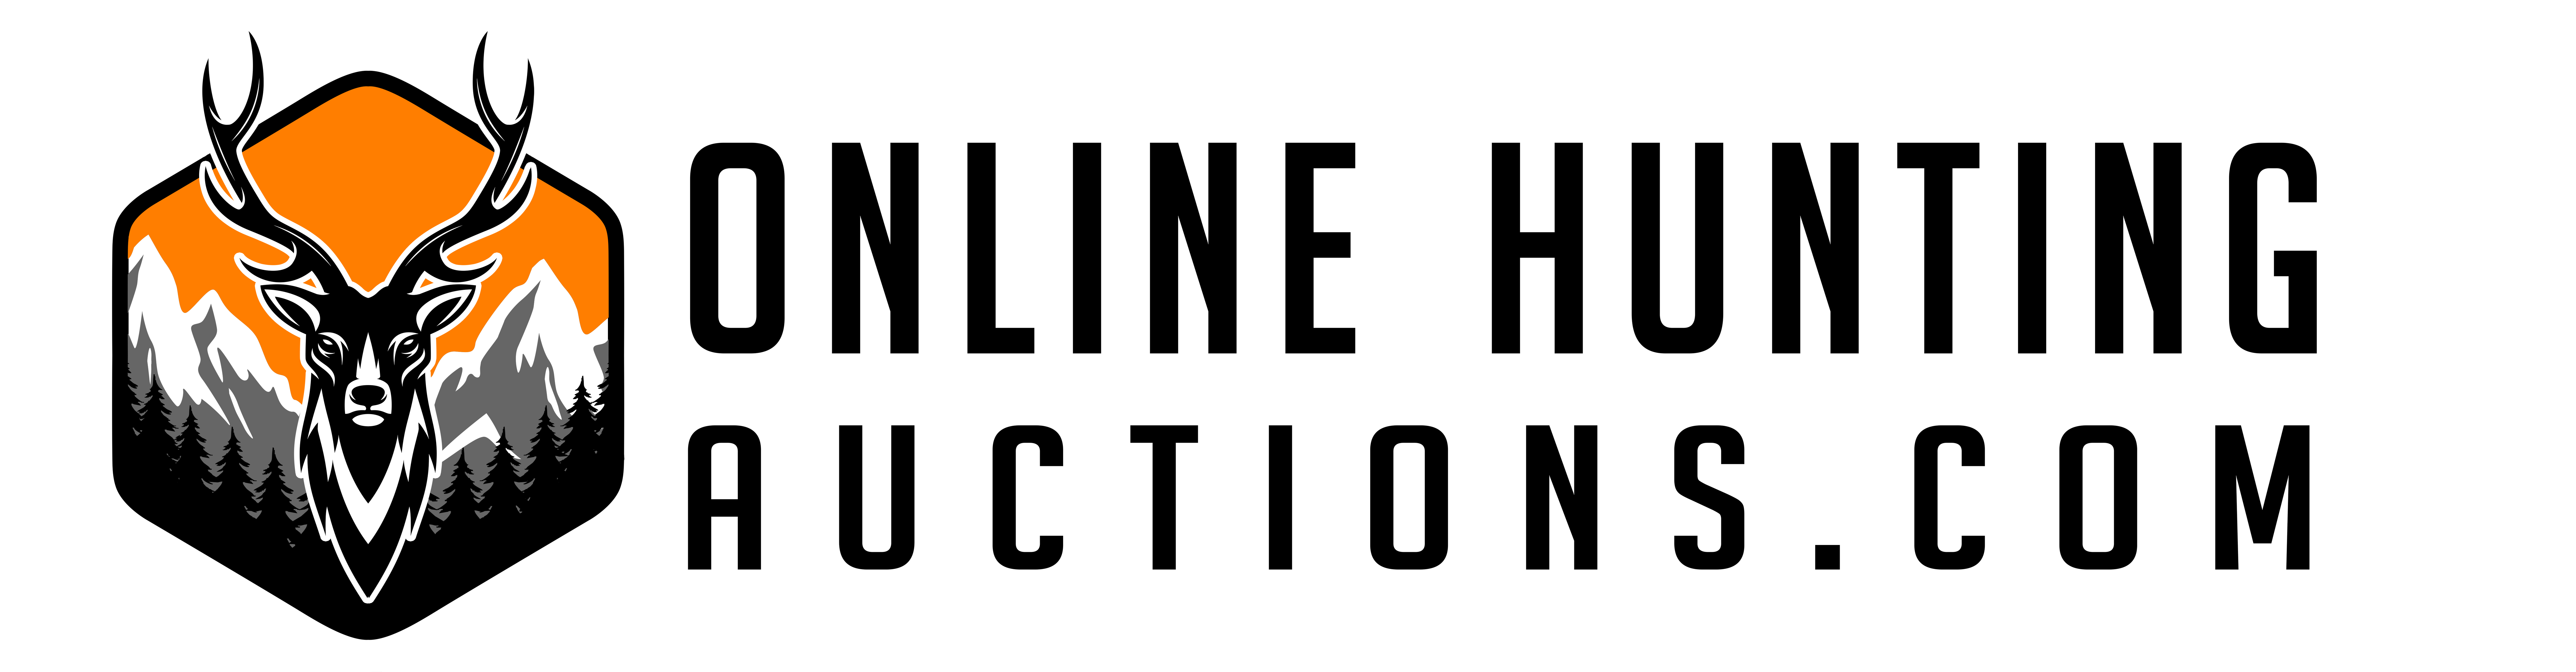 onlinehuntingauctions.com logo